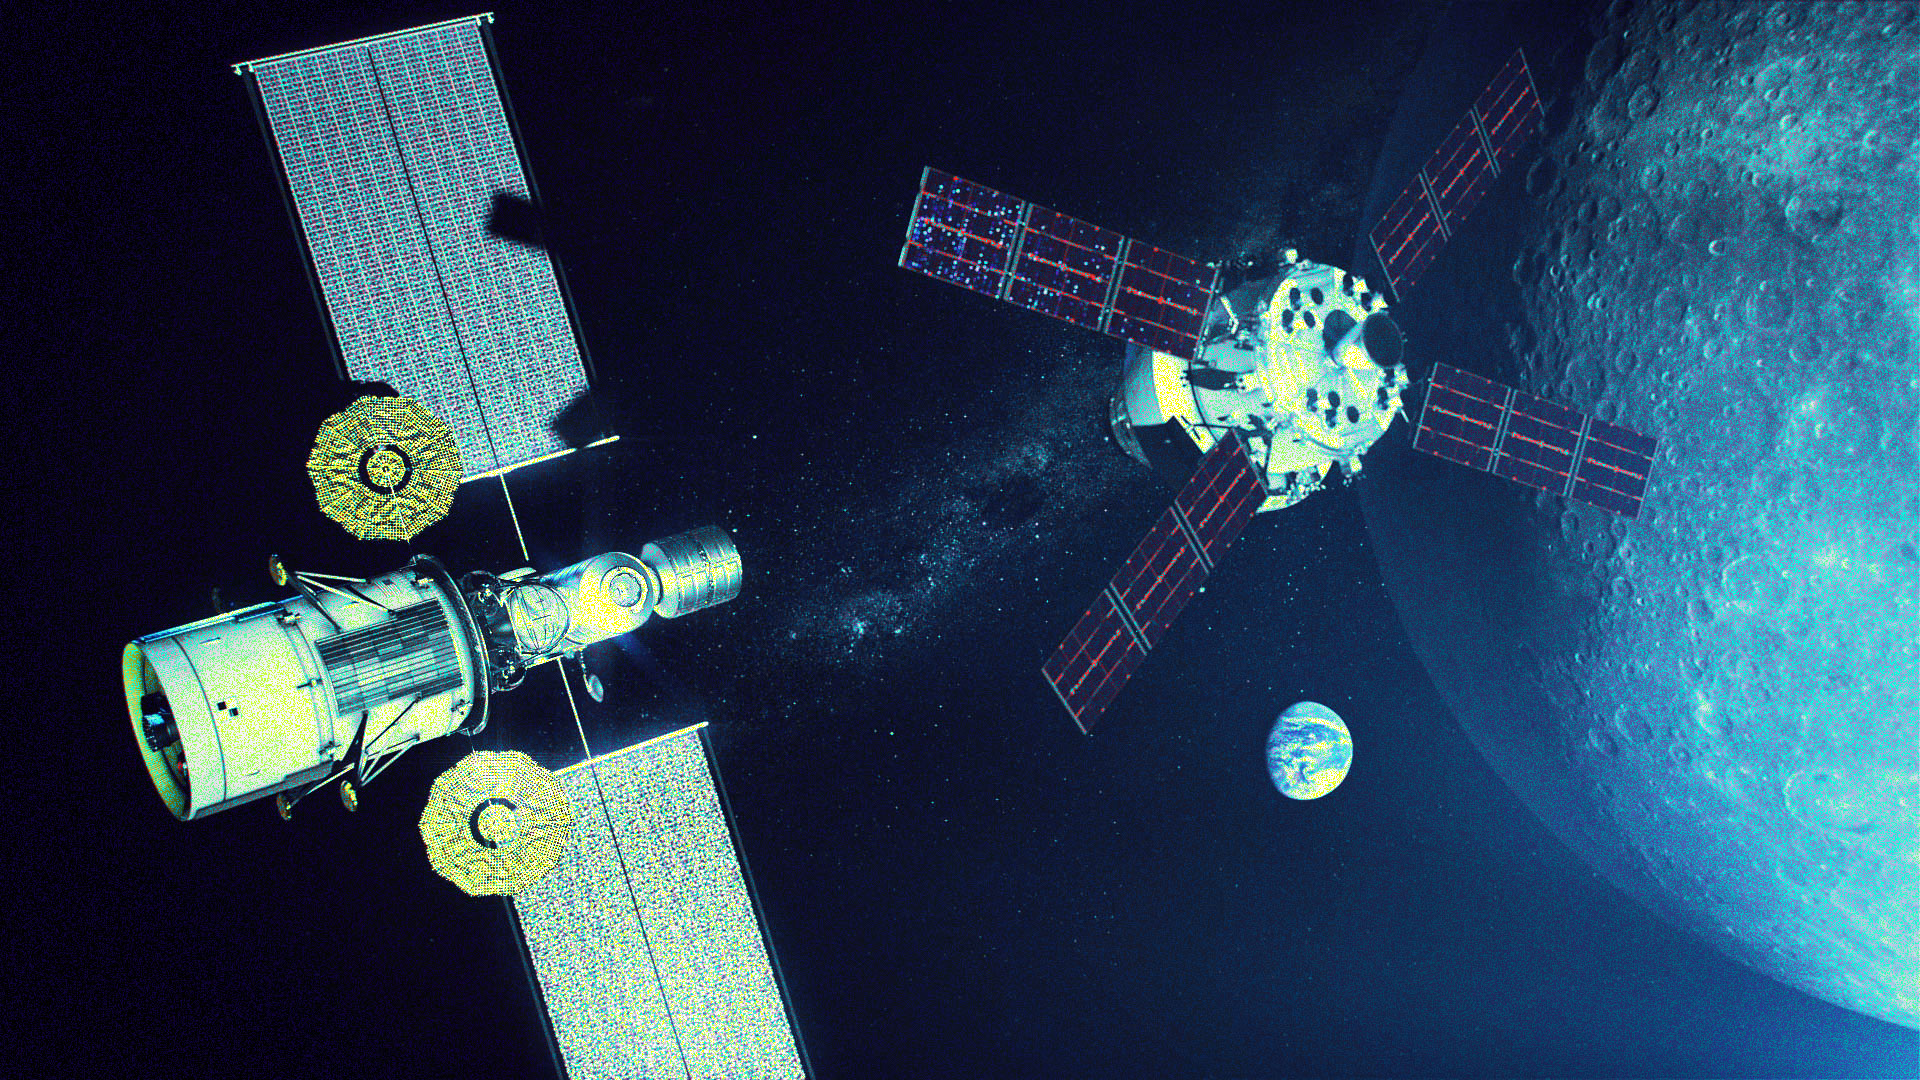 5 reasons why NASA's 2024 moon landing looks unlikely